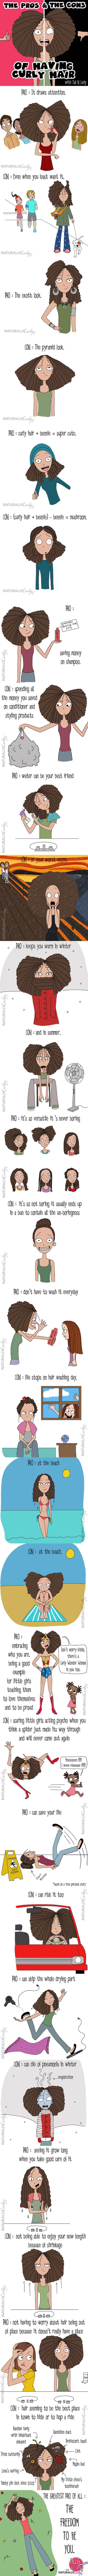 Having Curly Hair Is Not Easy